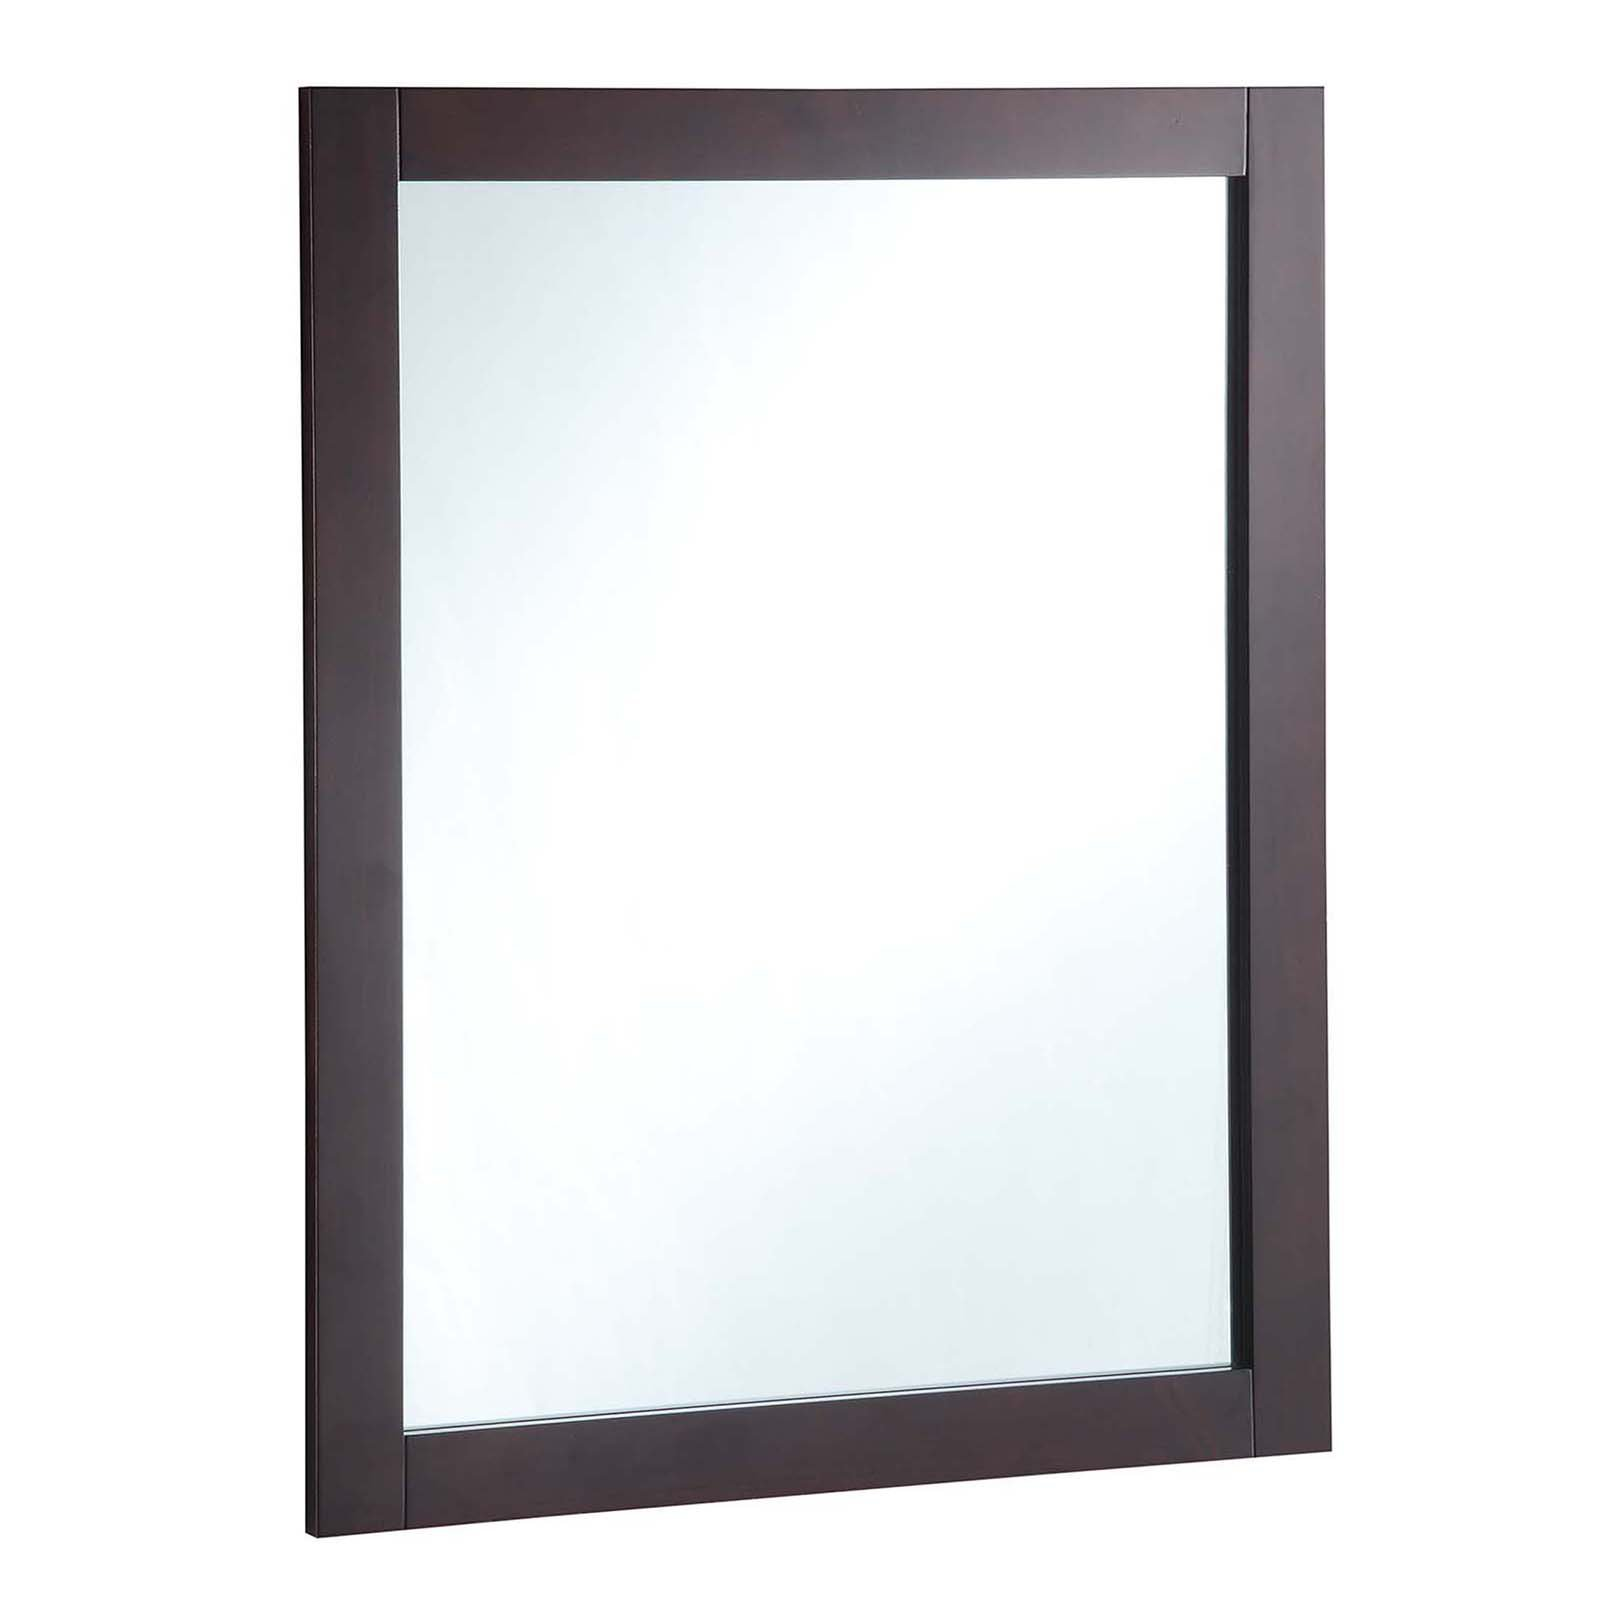 "Design House 547083 24"" x 30"" Vanity Mirror, Espresso by Design House"